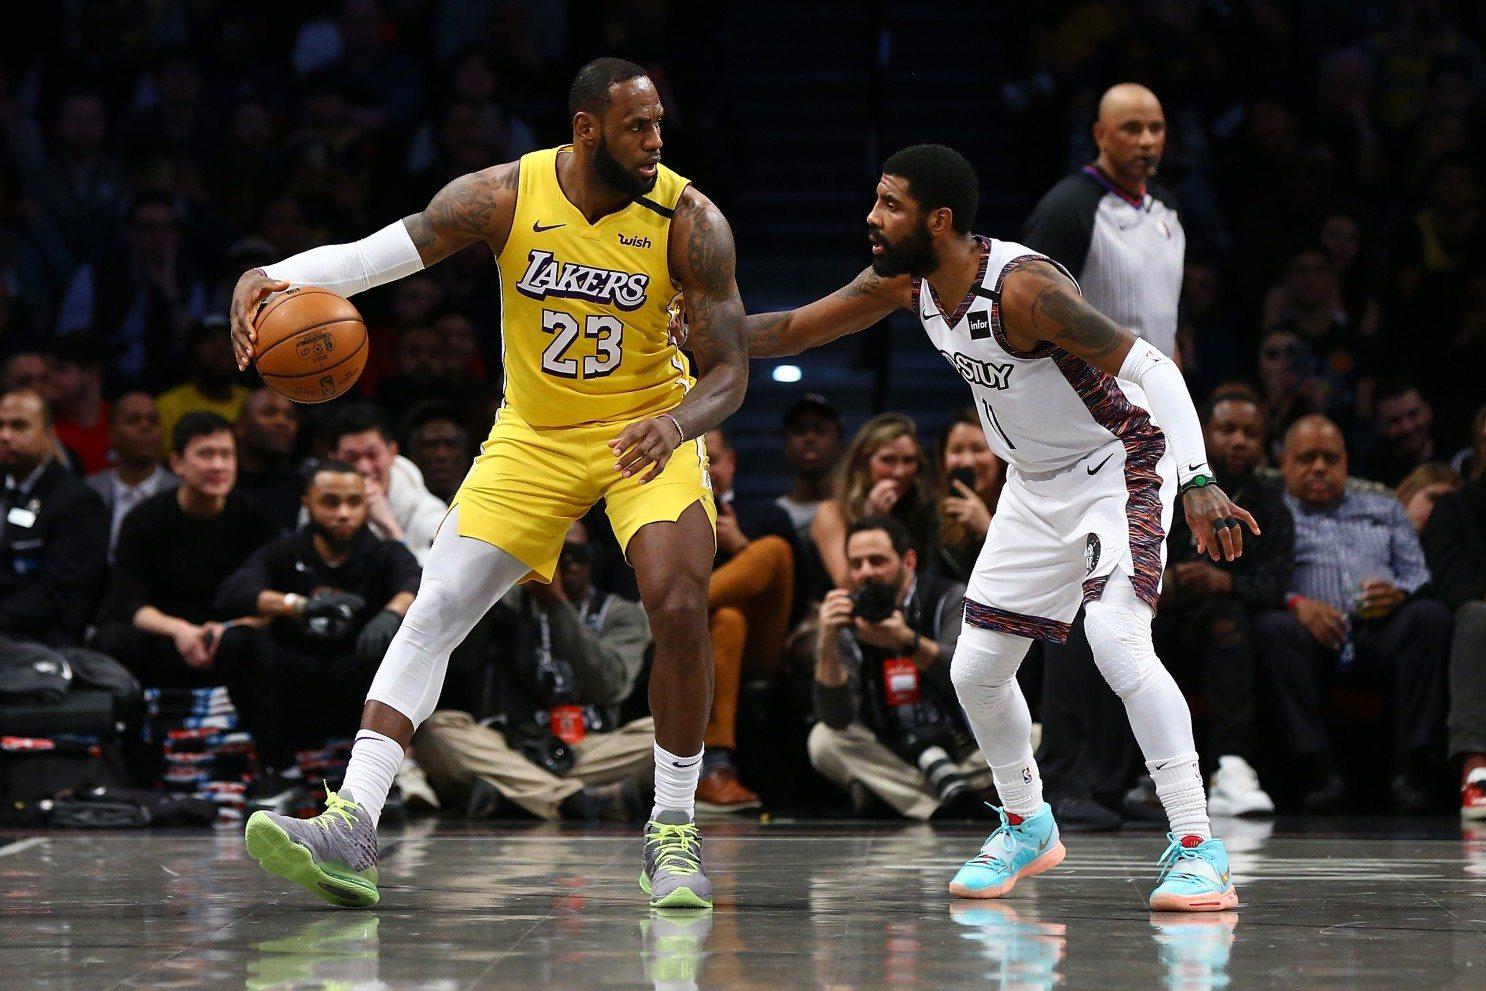 LeBron James Kyrie Irving 2022 NBA Championship Title odds Lakers Nets Bucks Suns